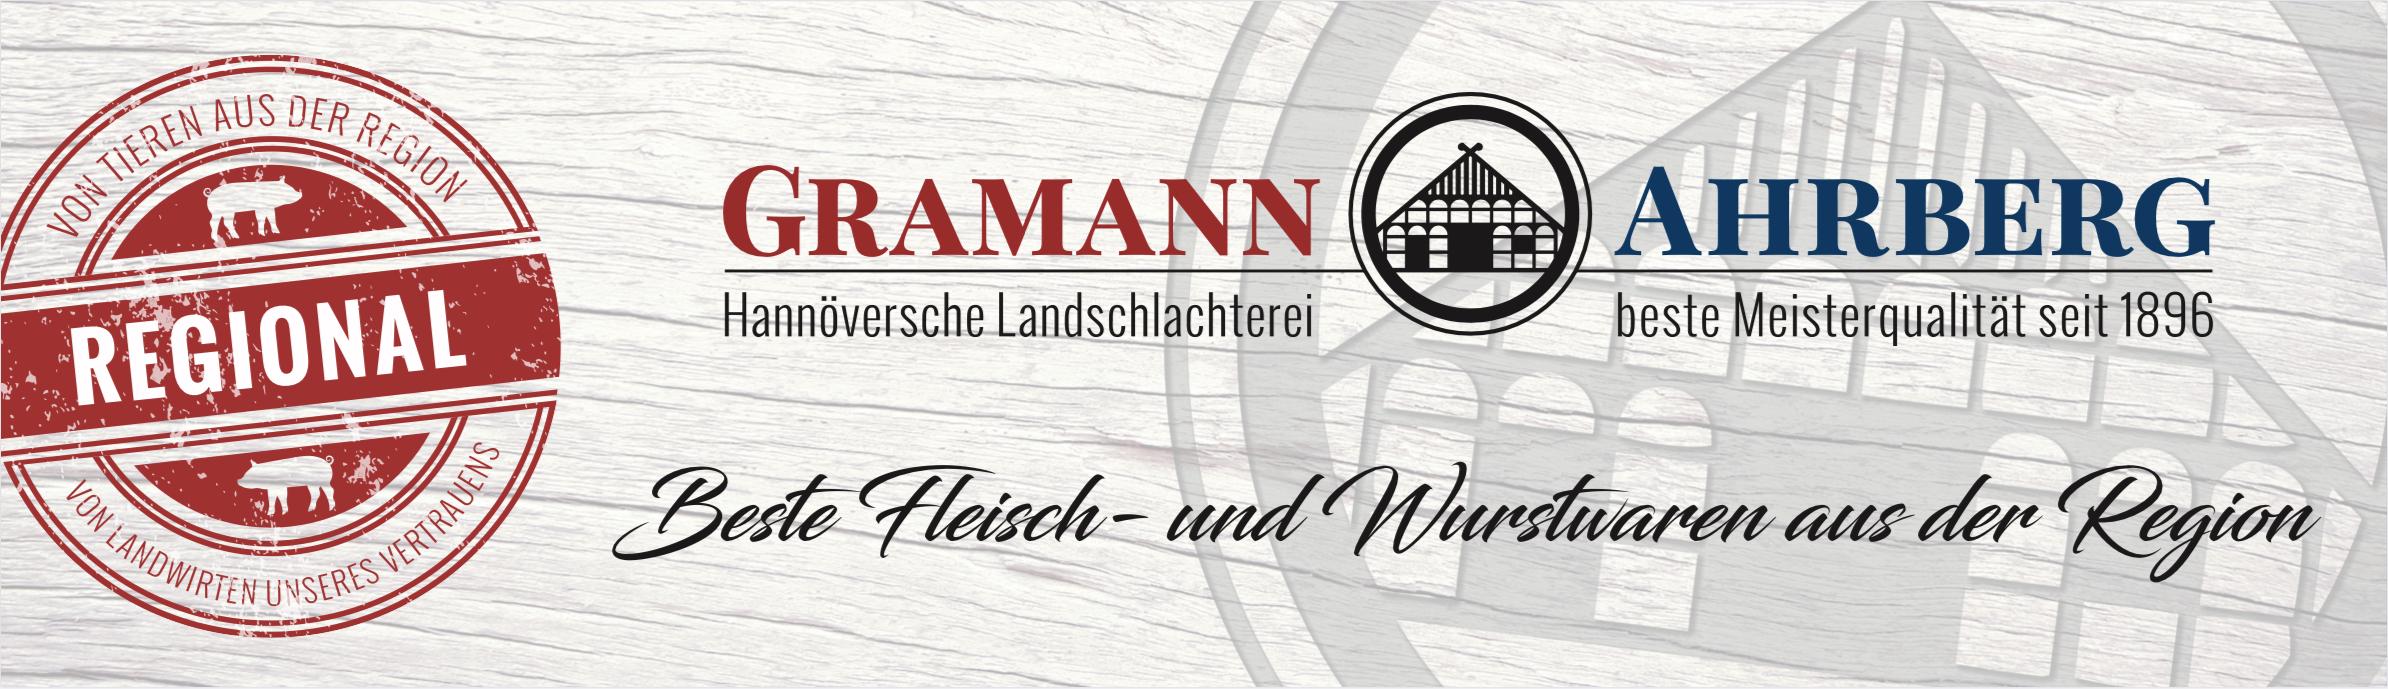 Gramann Partner